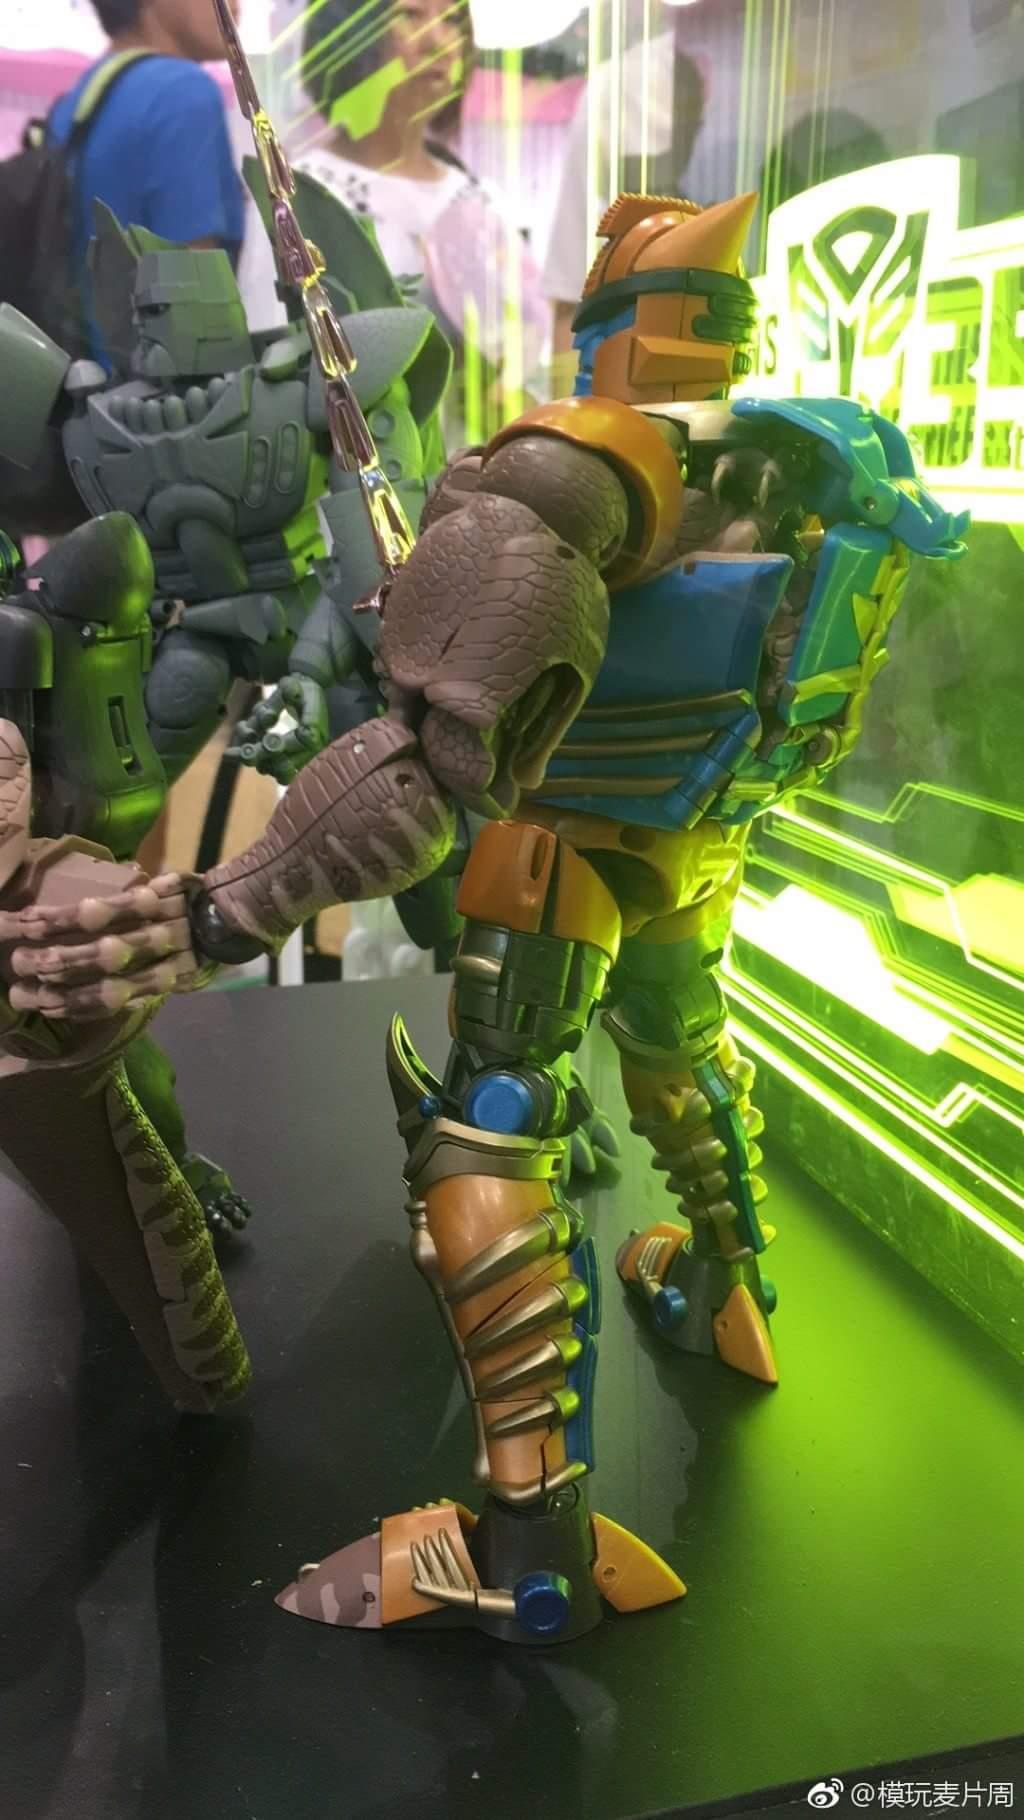 [Masterpiece] MP-41 Dinobot (Beast Wars) - Page 2 IkNWL2bb_o